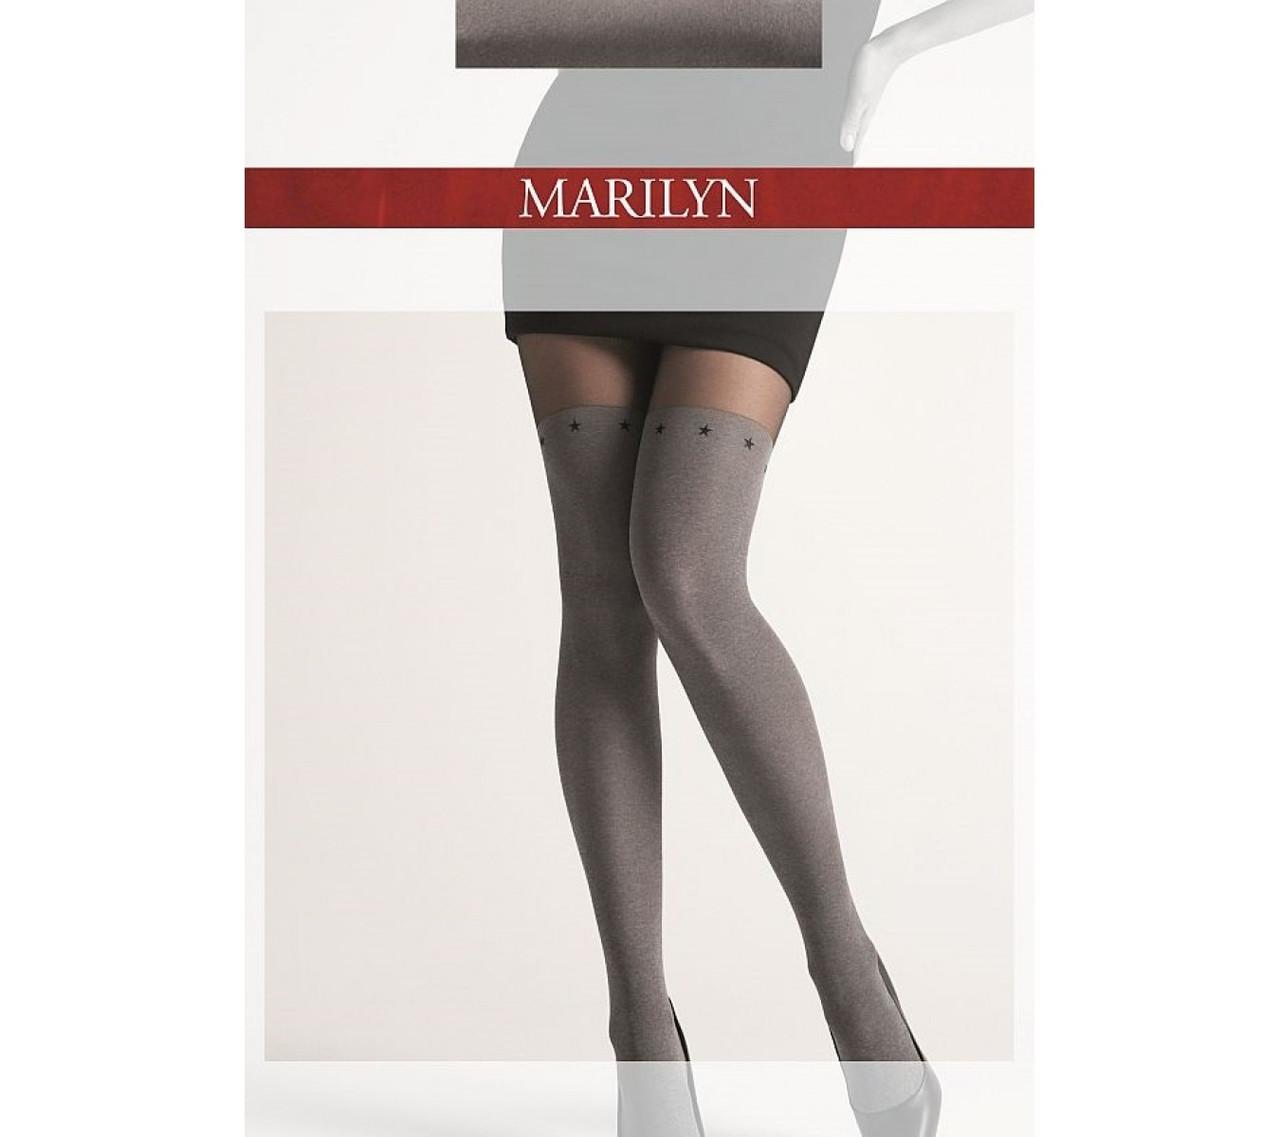 Фантазийные колготки Marilyn Zazu M11 с имитацией чулка